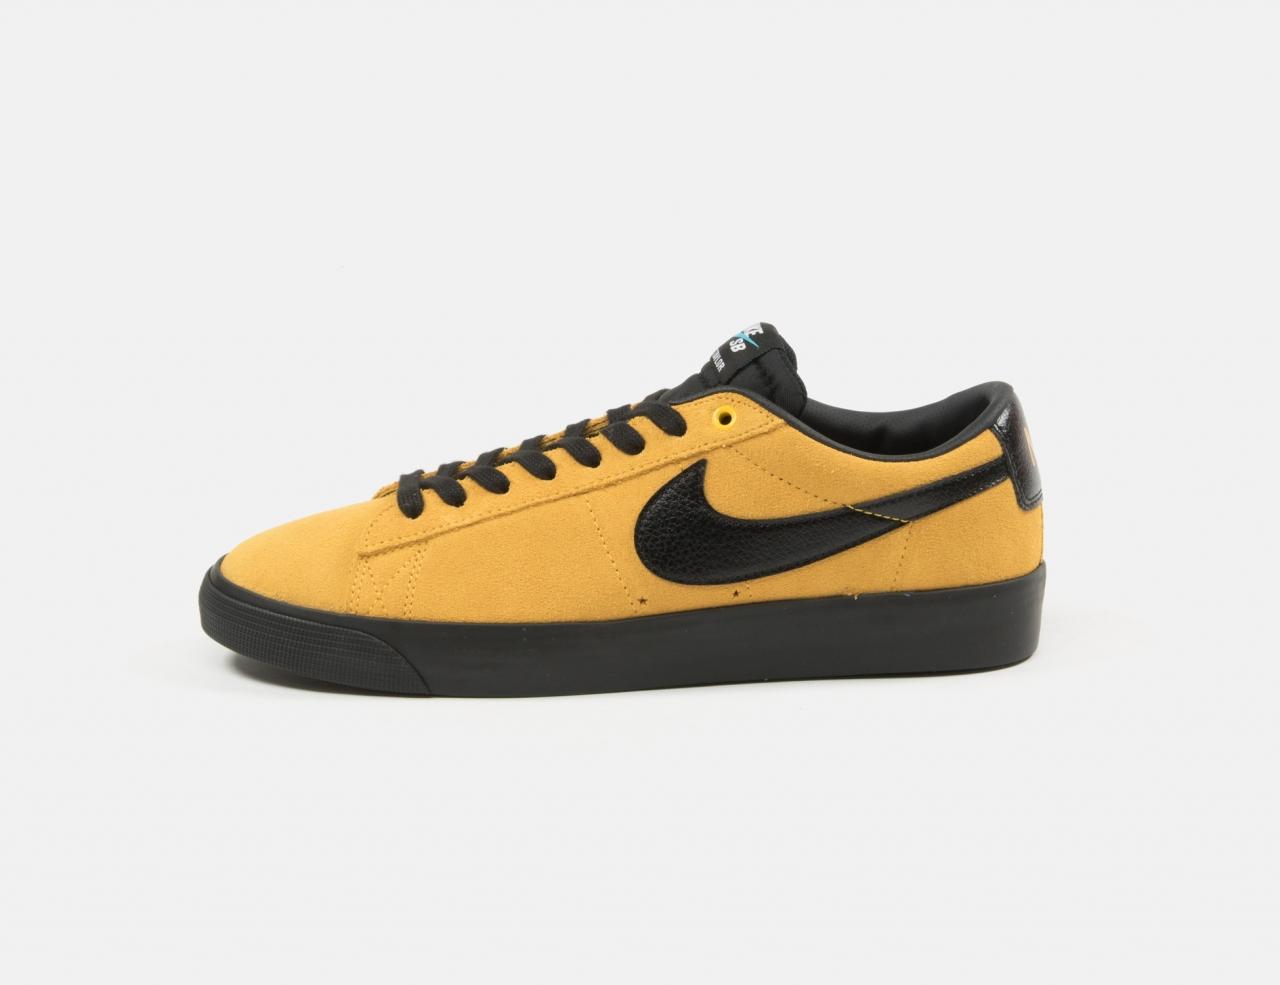 Nike SB Blazer Low GT - University Gold/Black